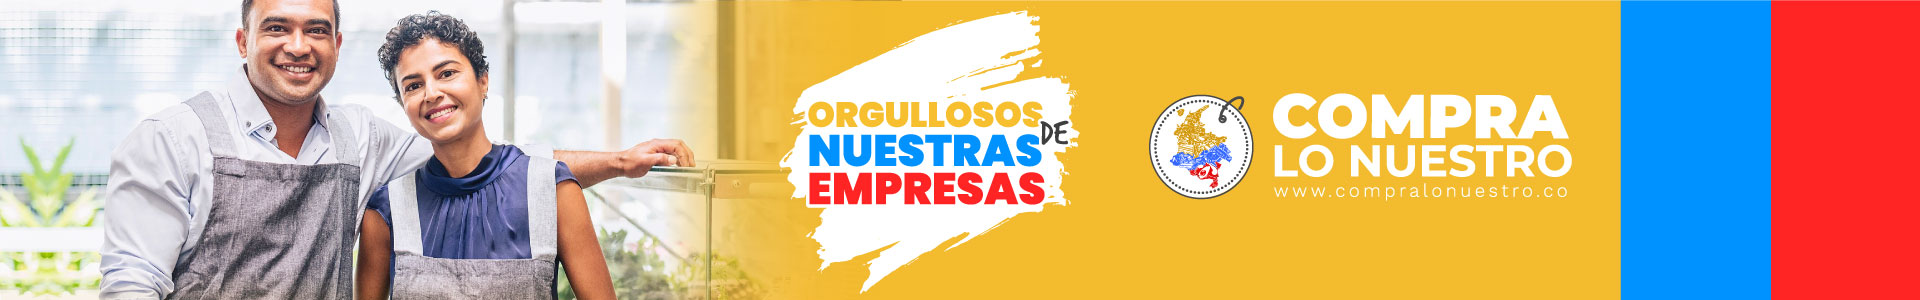 #OrgullososDeNuestrasEmpresas #CompraLoNuestro